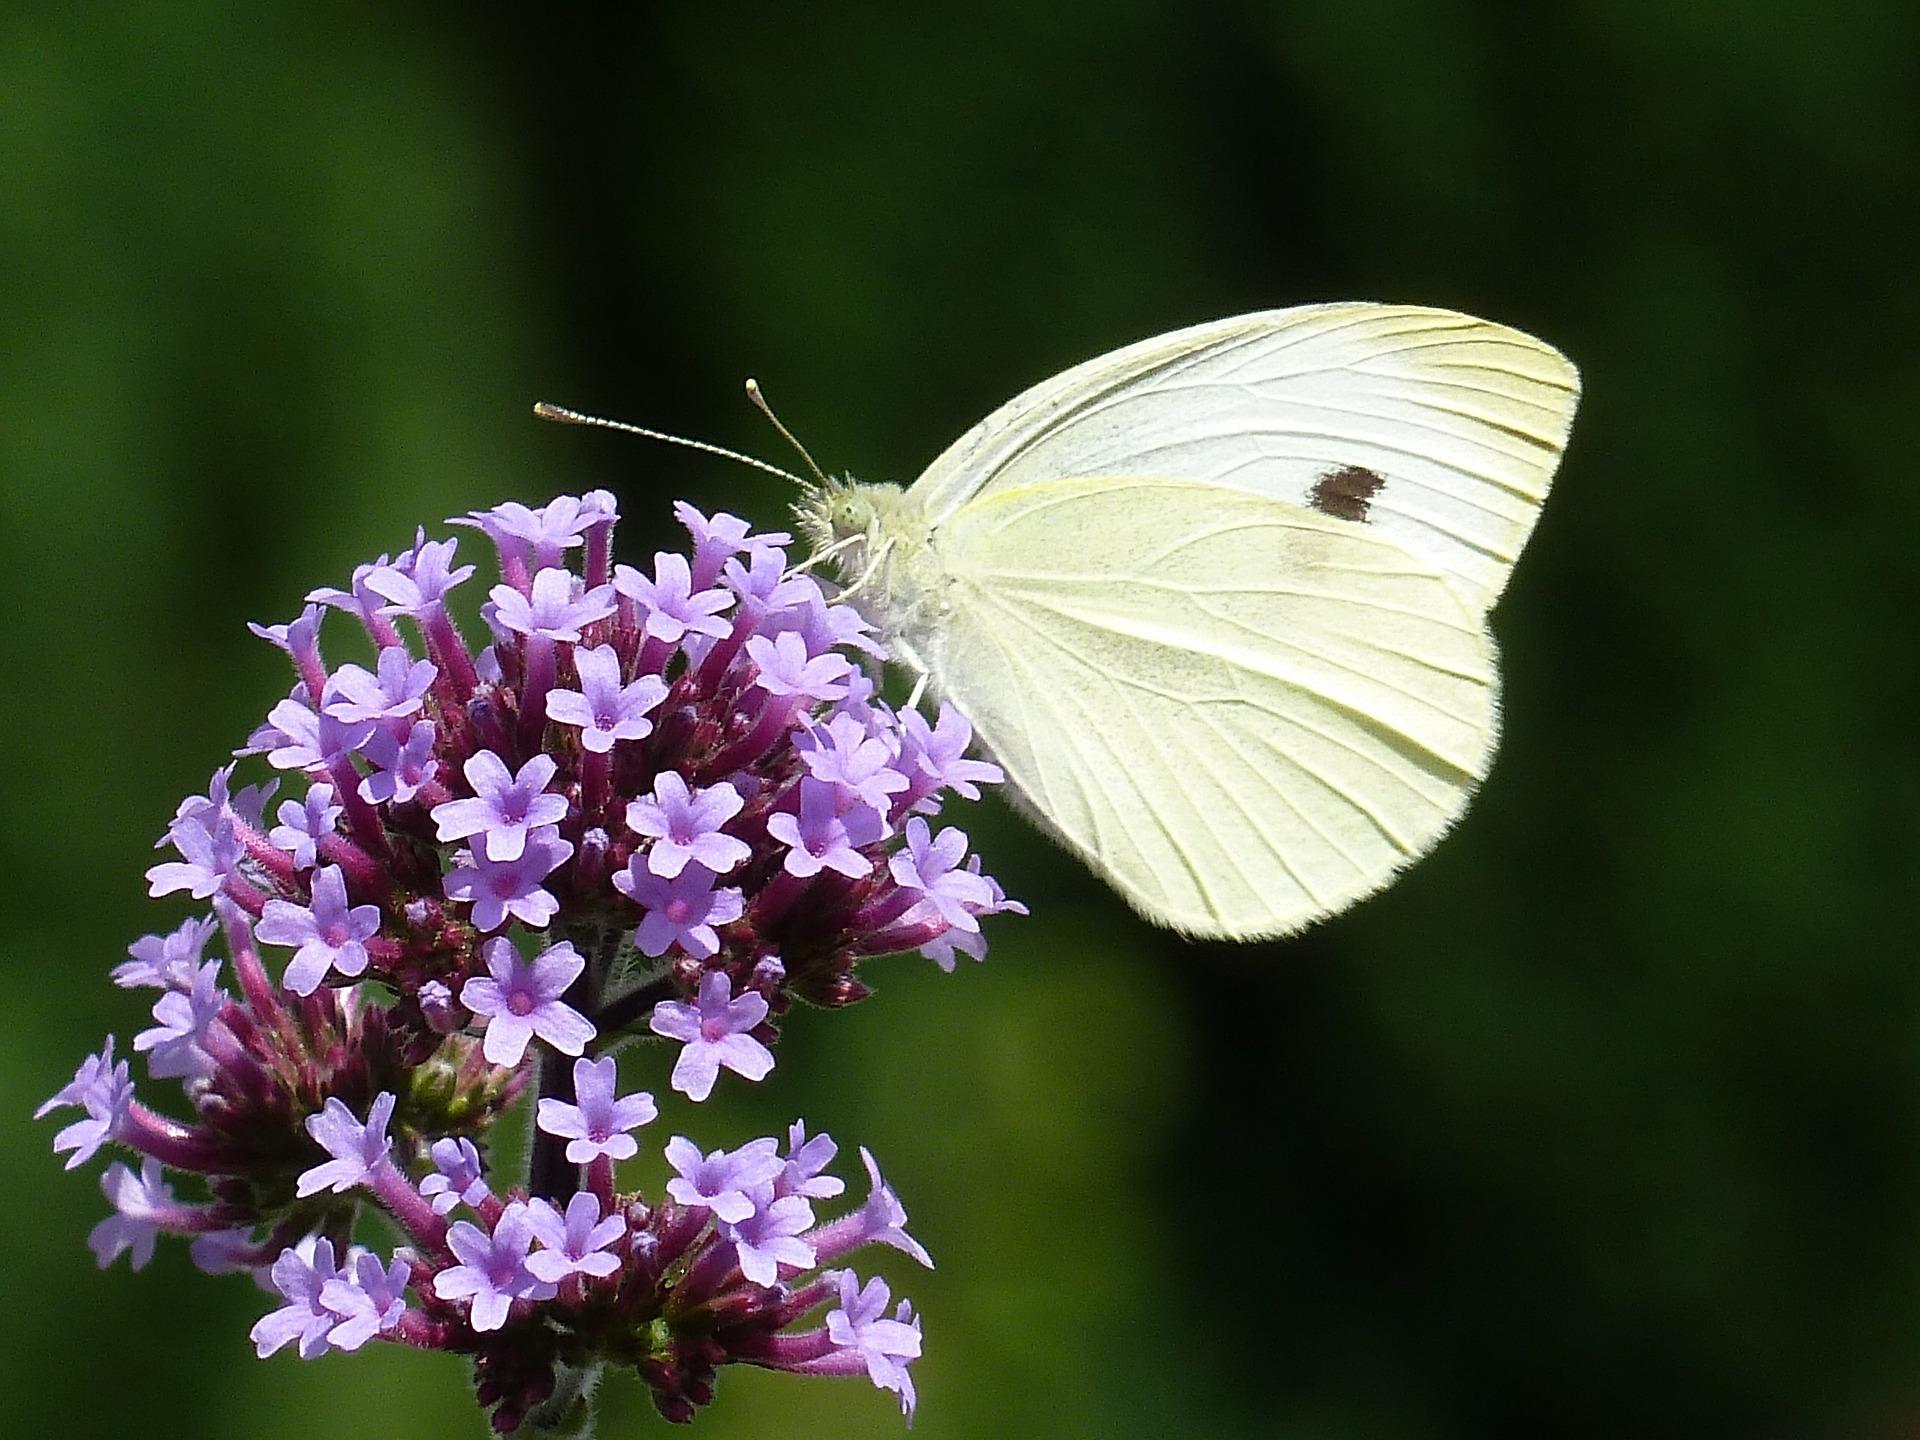 Verbena & Butterfly